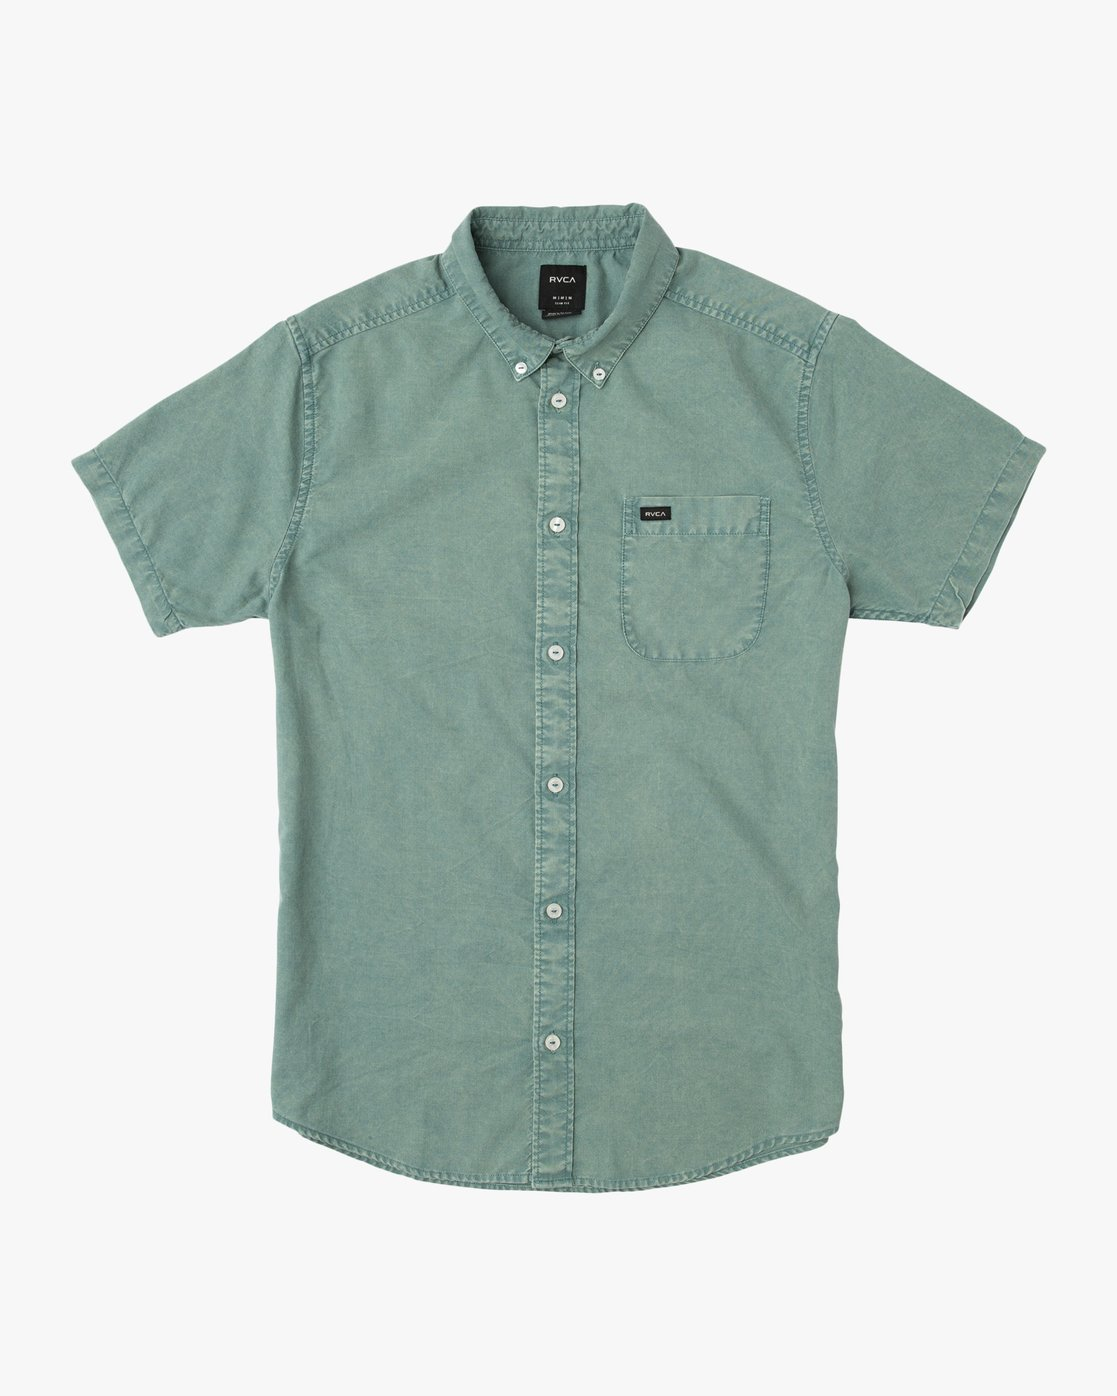 0 Boy's That'll Do Washed Button-Up Shirt Green B592SRTR RVCA